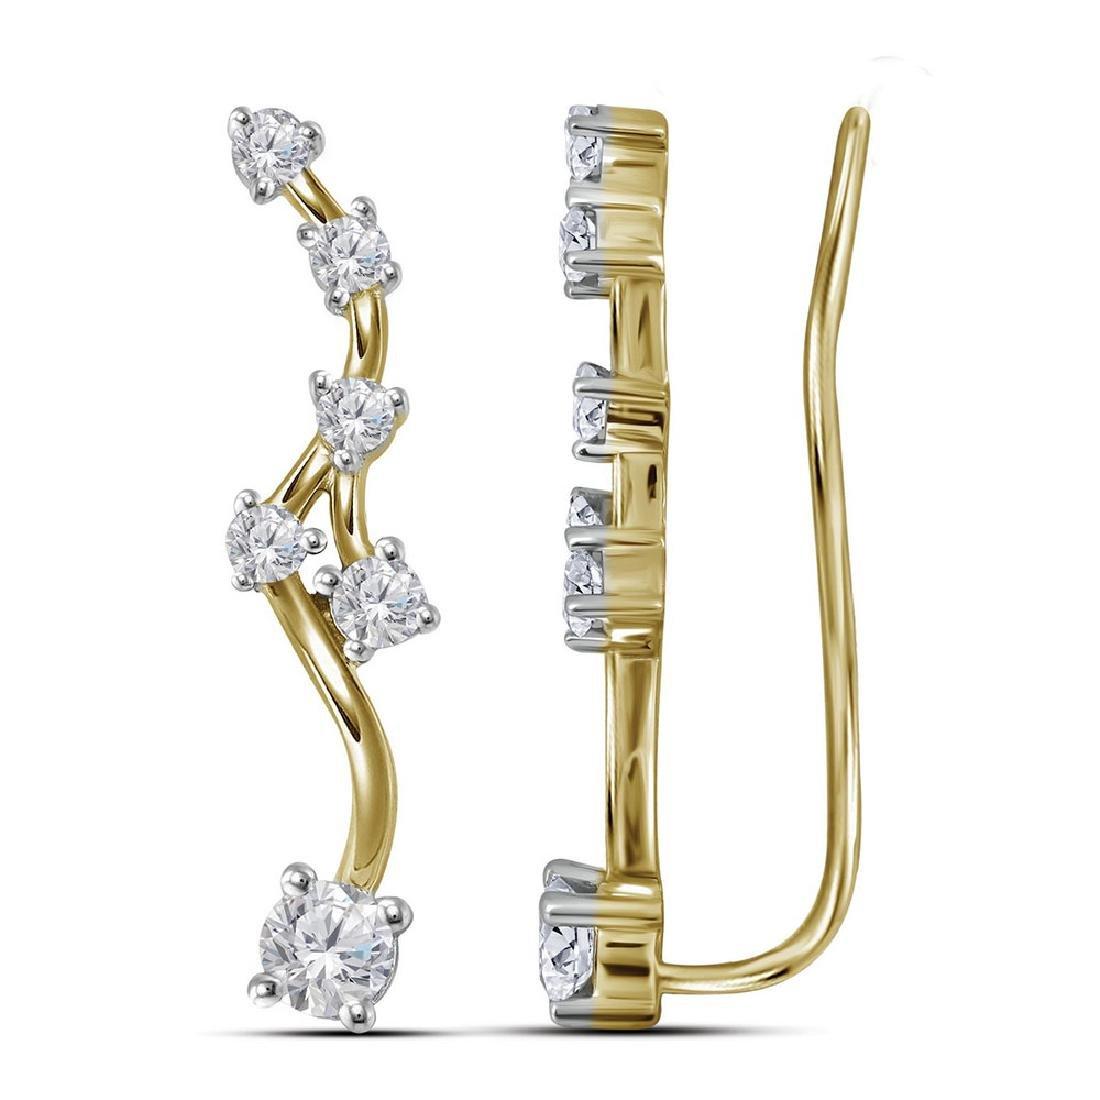 0.73 CTW Diamond Climber Earrings 10KT Yellow Gold -